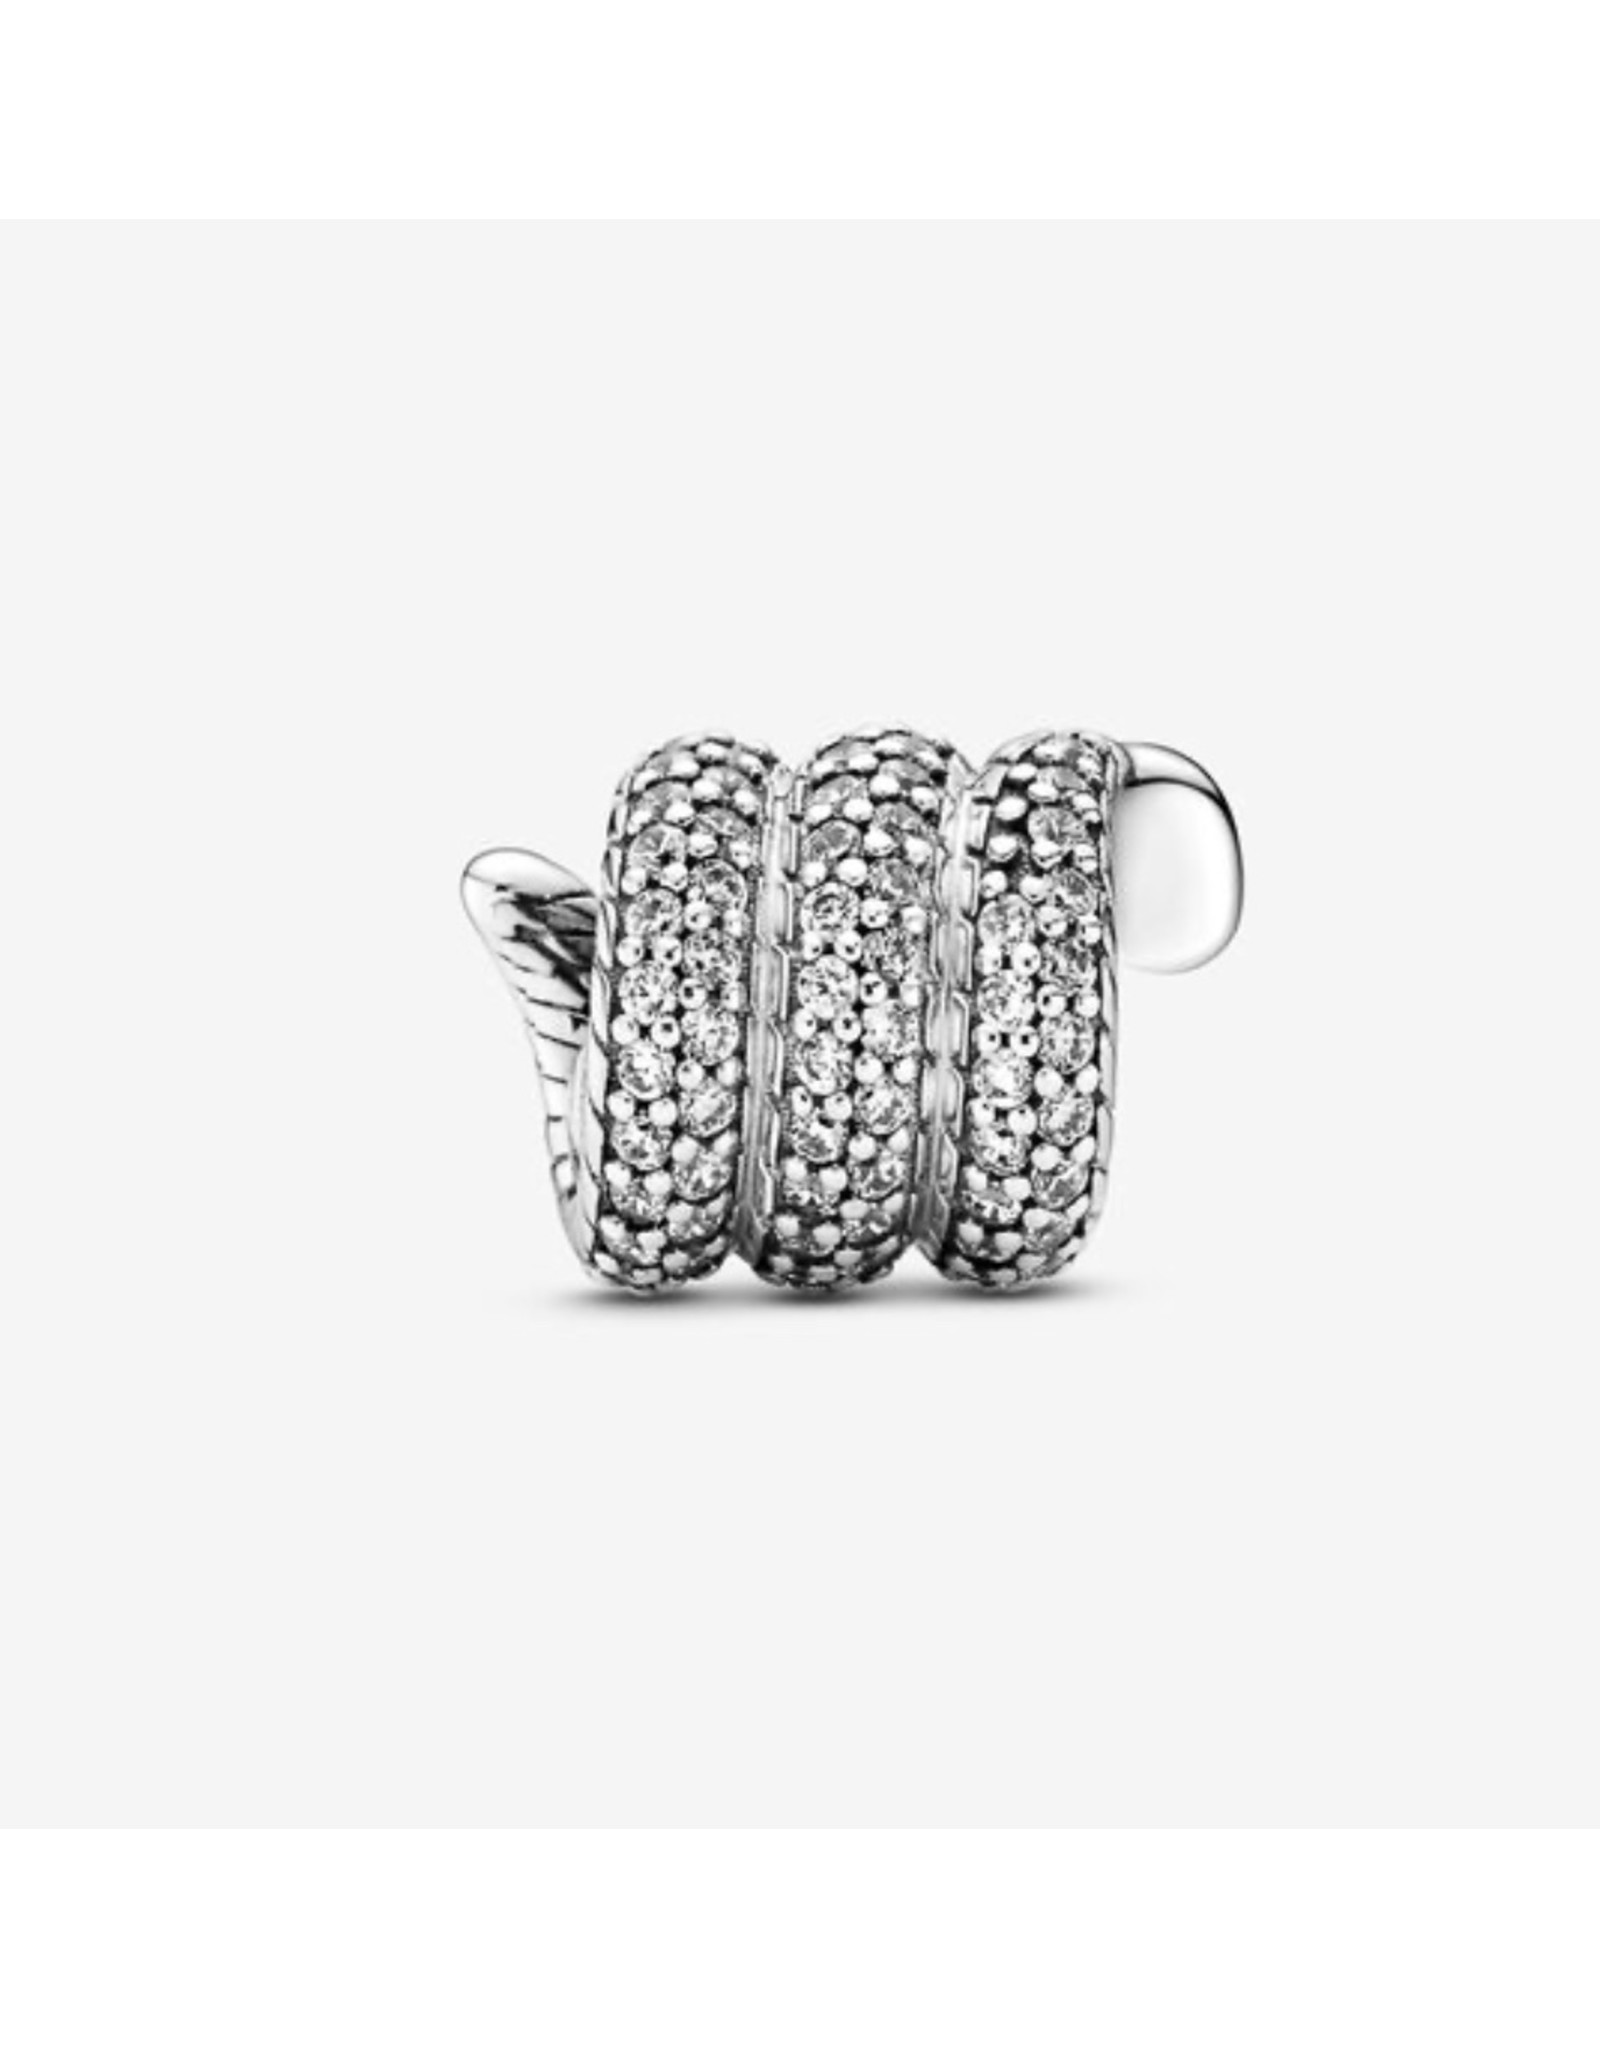 Pandora Pandora Charm,799099C01,Sparkling Wrapped Snake, Sterling Silver, Clear CZ